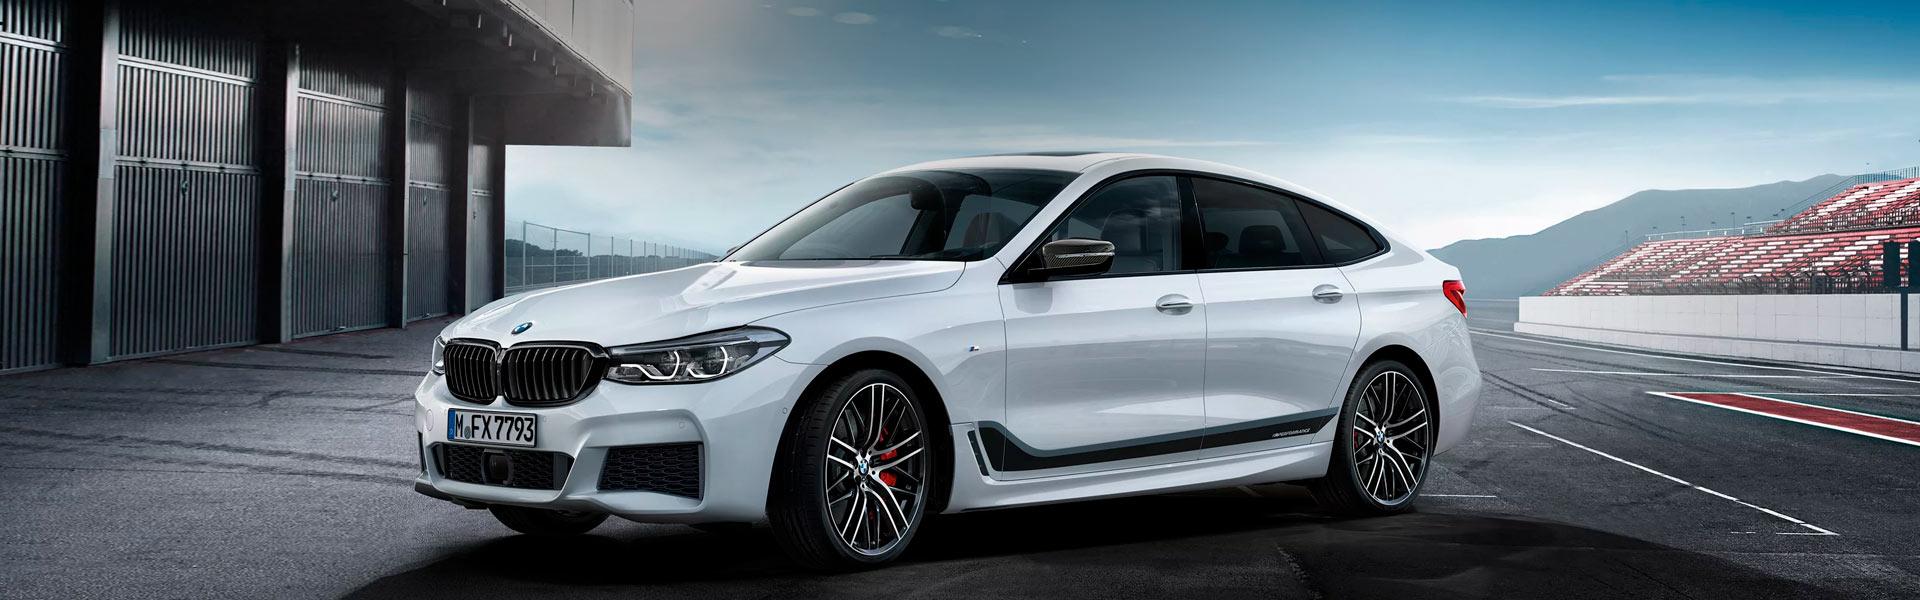 Сервис BMW 6-series